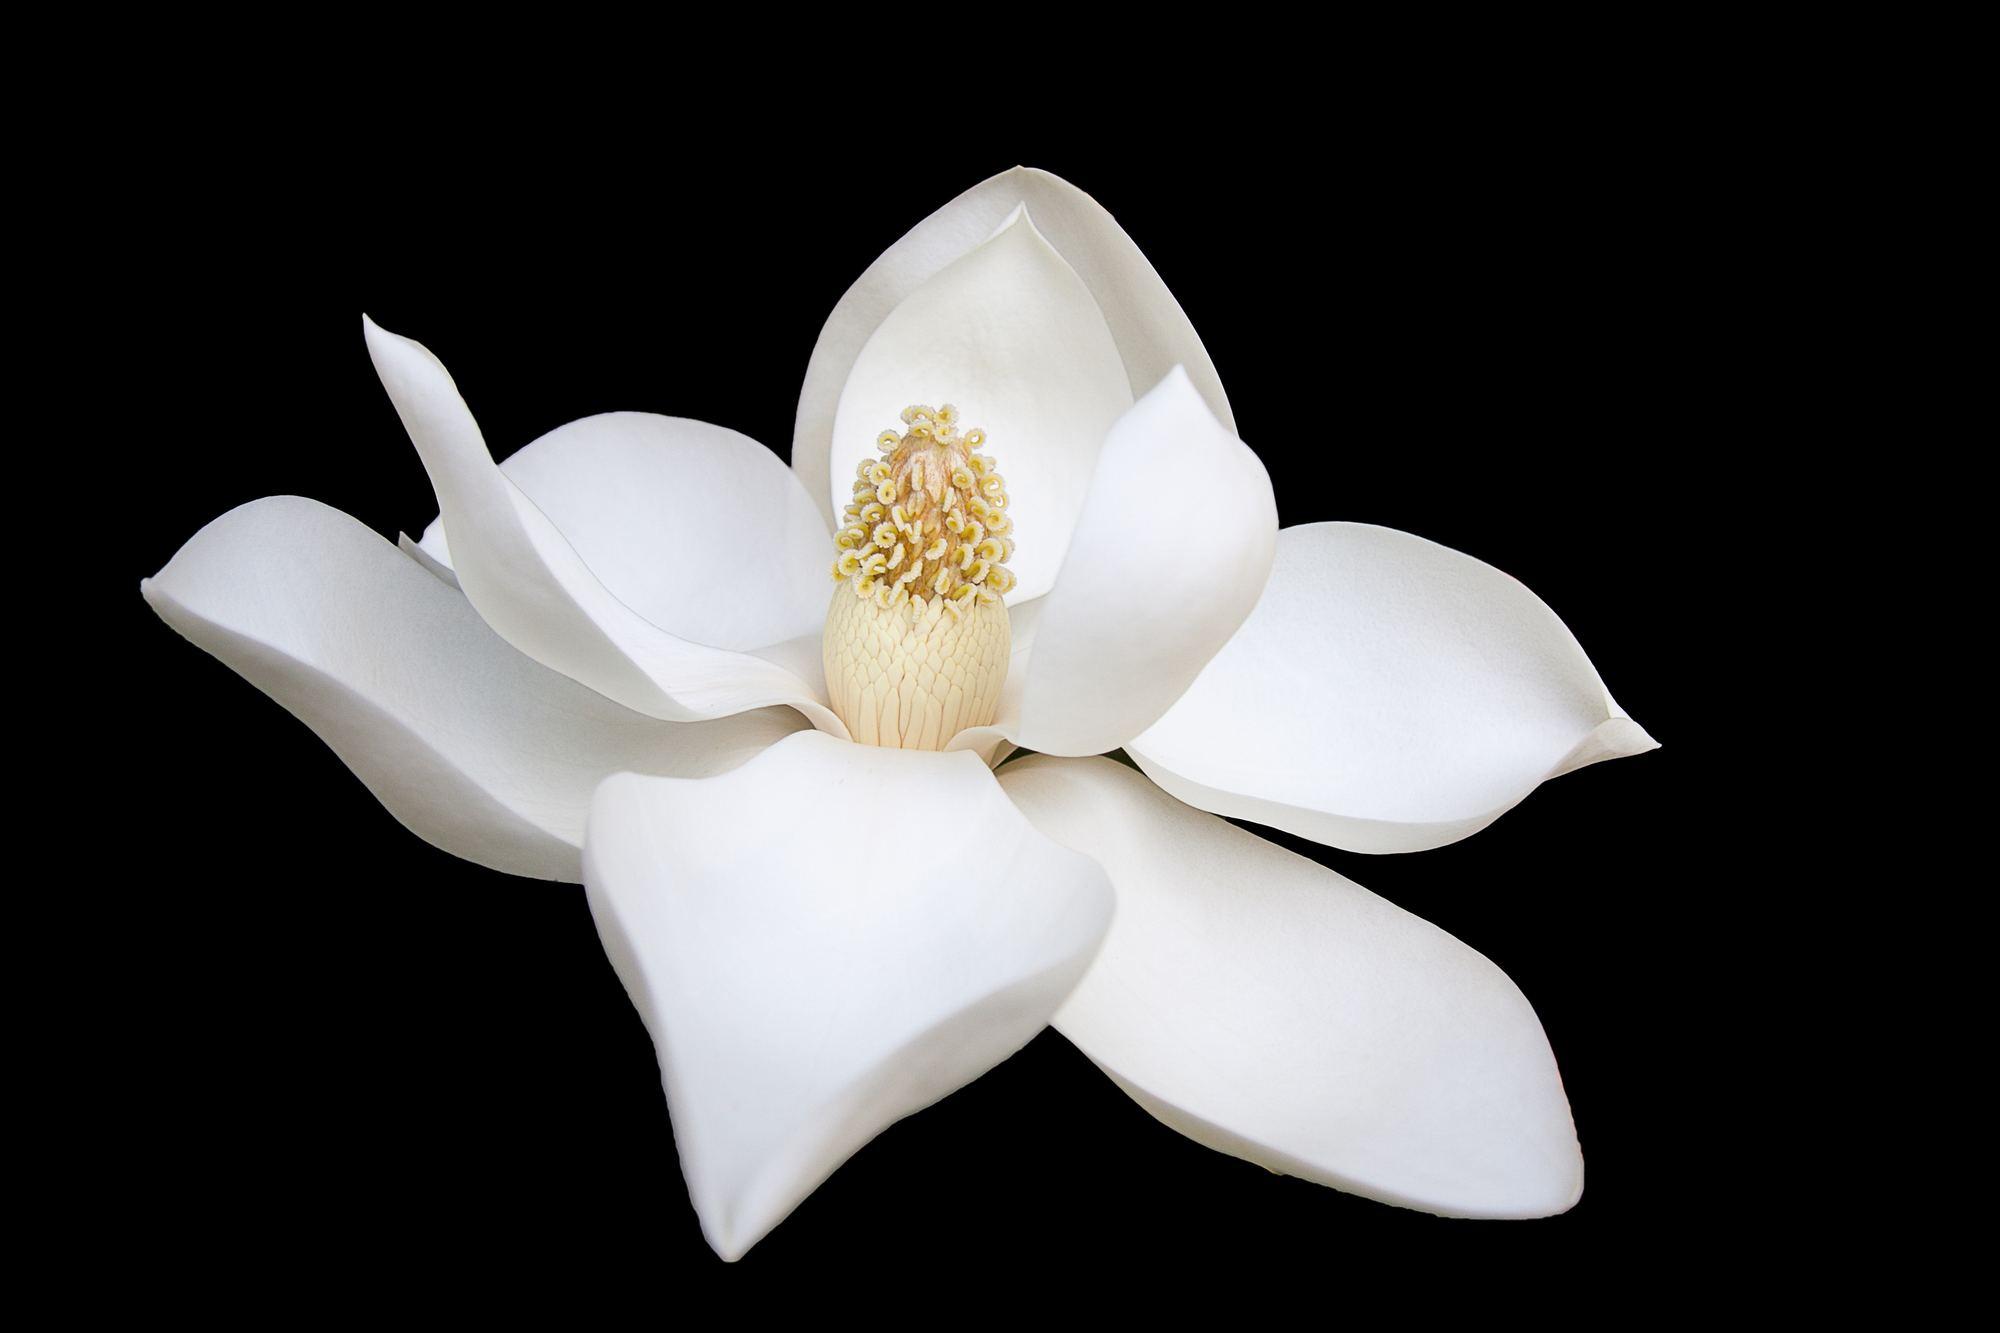 White color branding